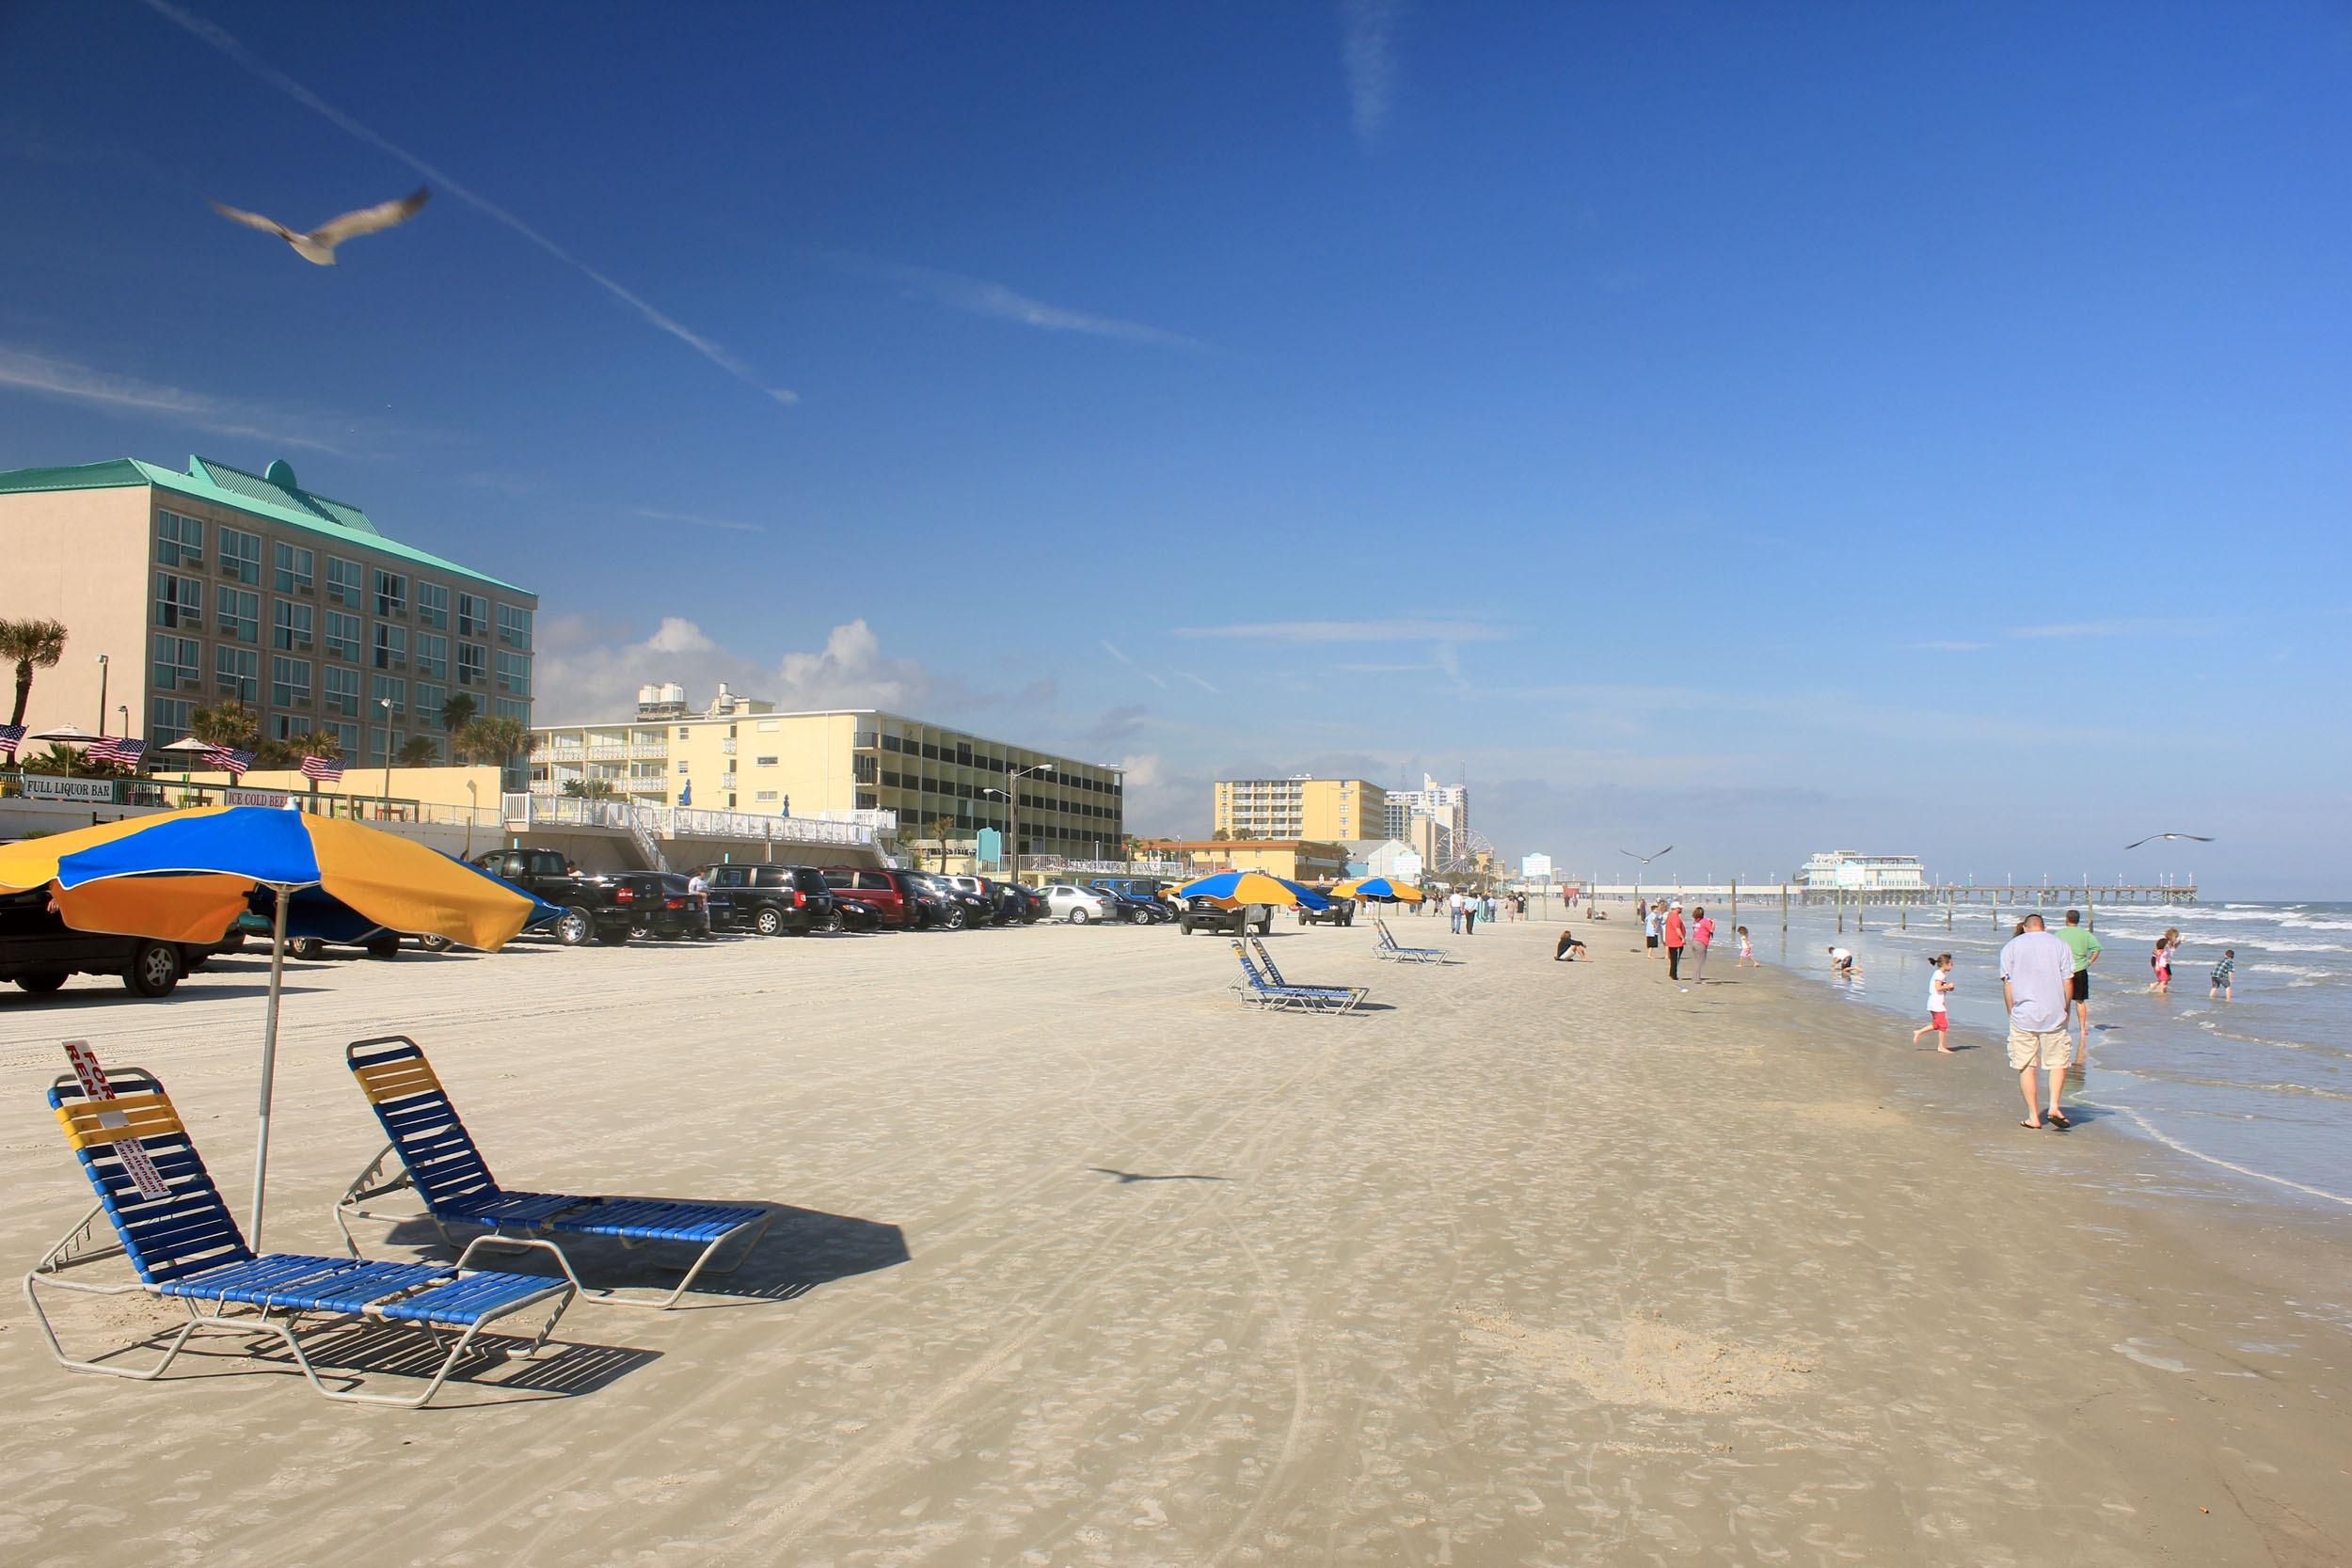 Beach Sea Coast Ocean Boardwalk Walkway Vacation Usa America Florida Daytona Atmosphere Of Earth